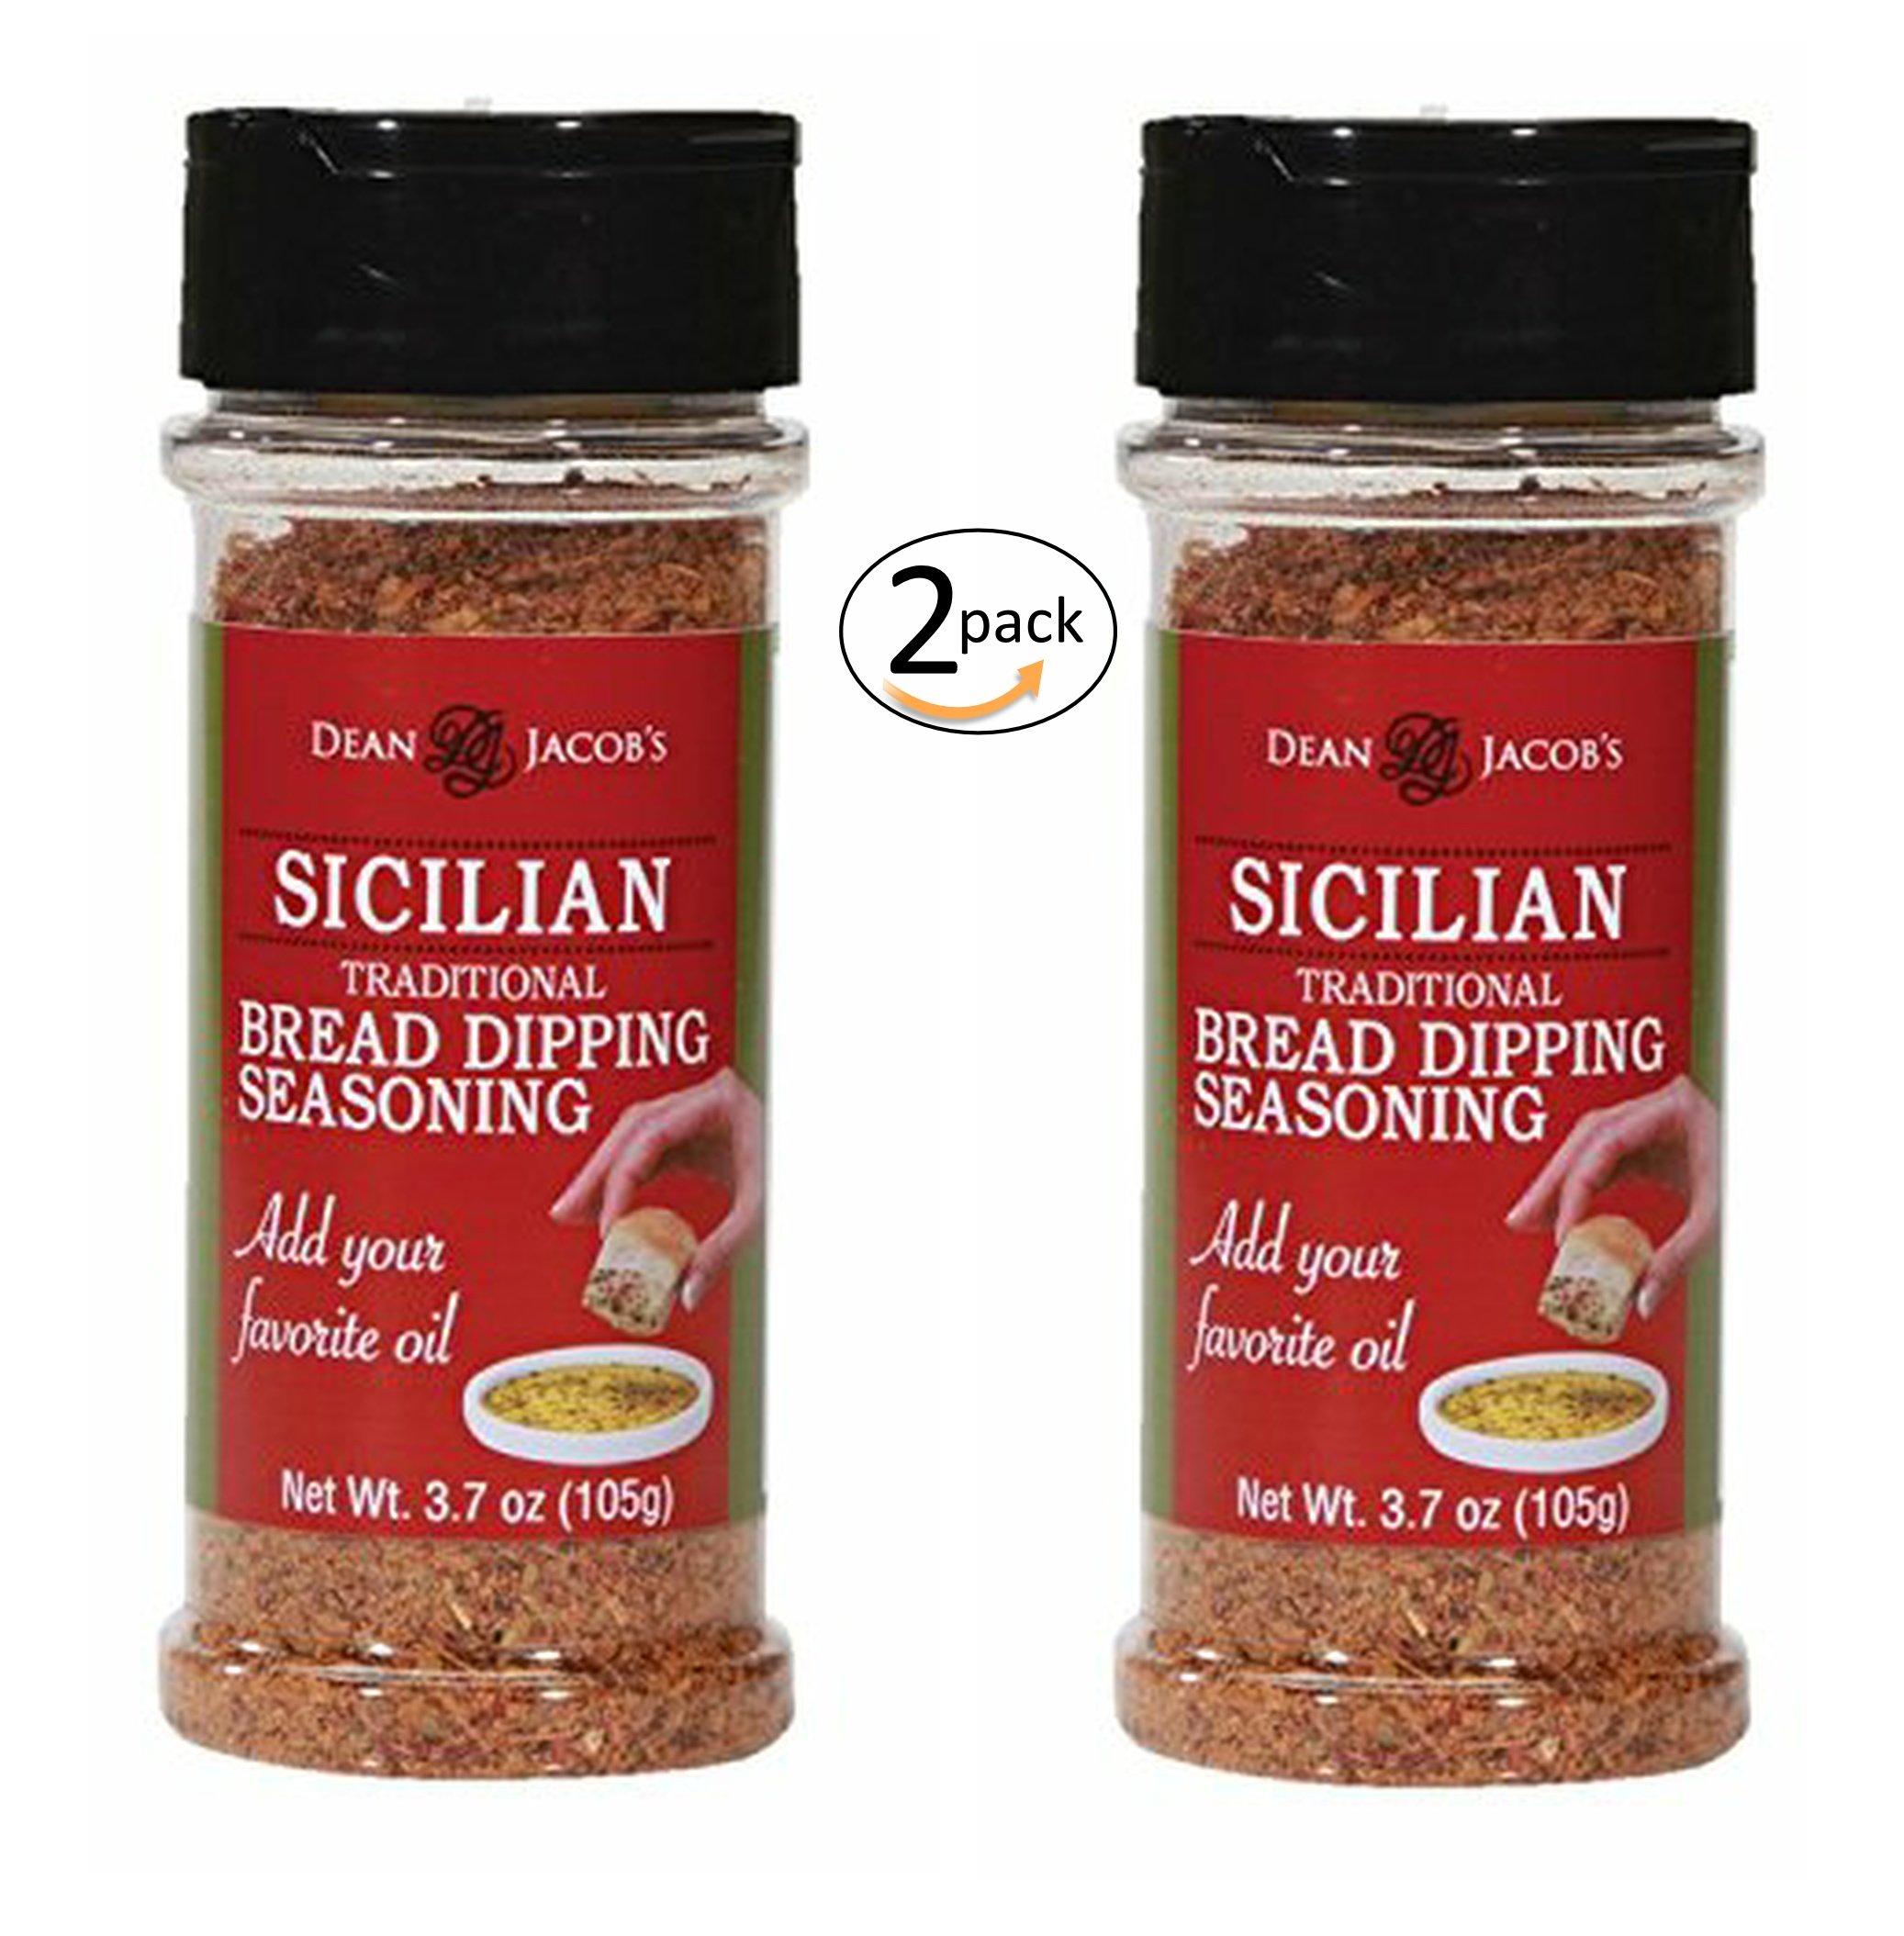 Dean Jacob's Sicilian Bread Dipping Seasoning ~ 3.7 oz. Stacking Jar 2 pack